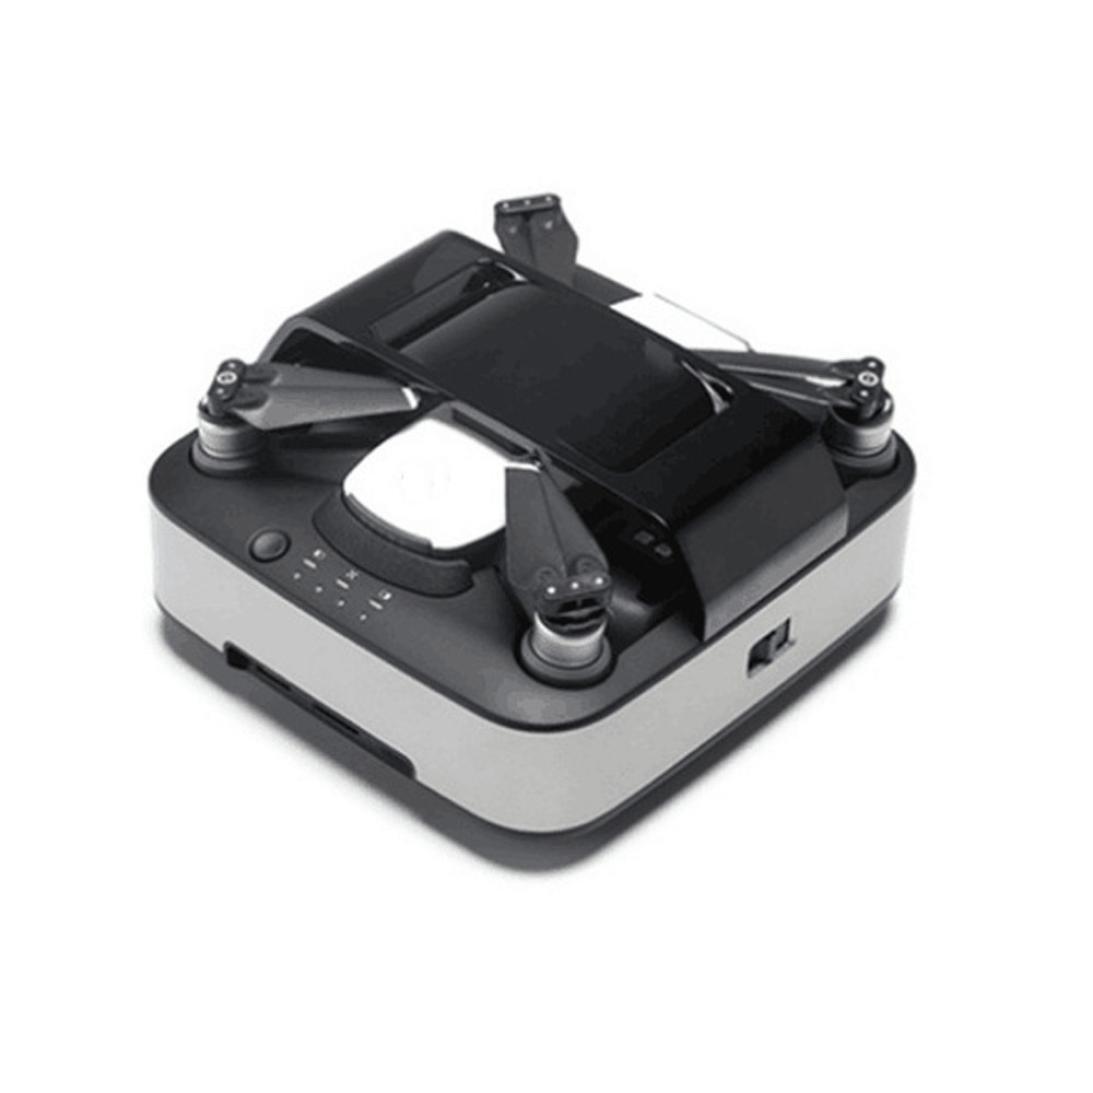 [DJI Spark Accessories] 5000mAh Safe Intelligence Efficient Portable Charging Station (Black)